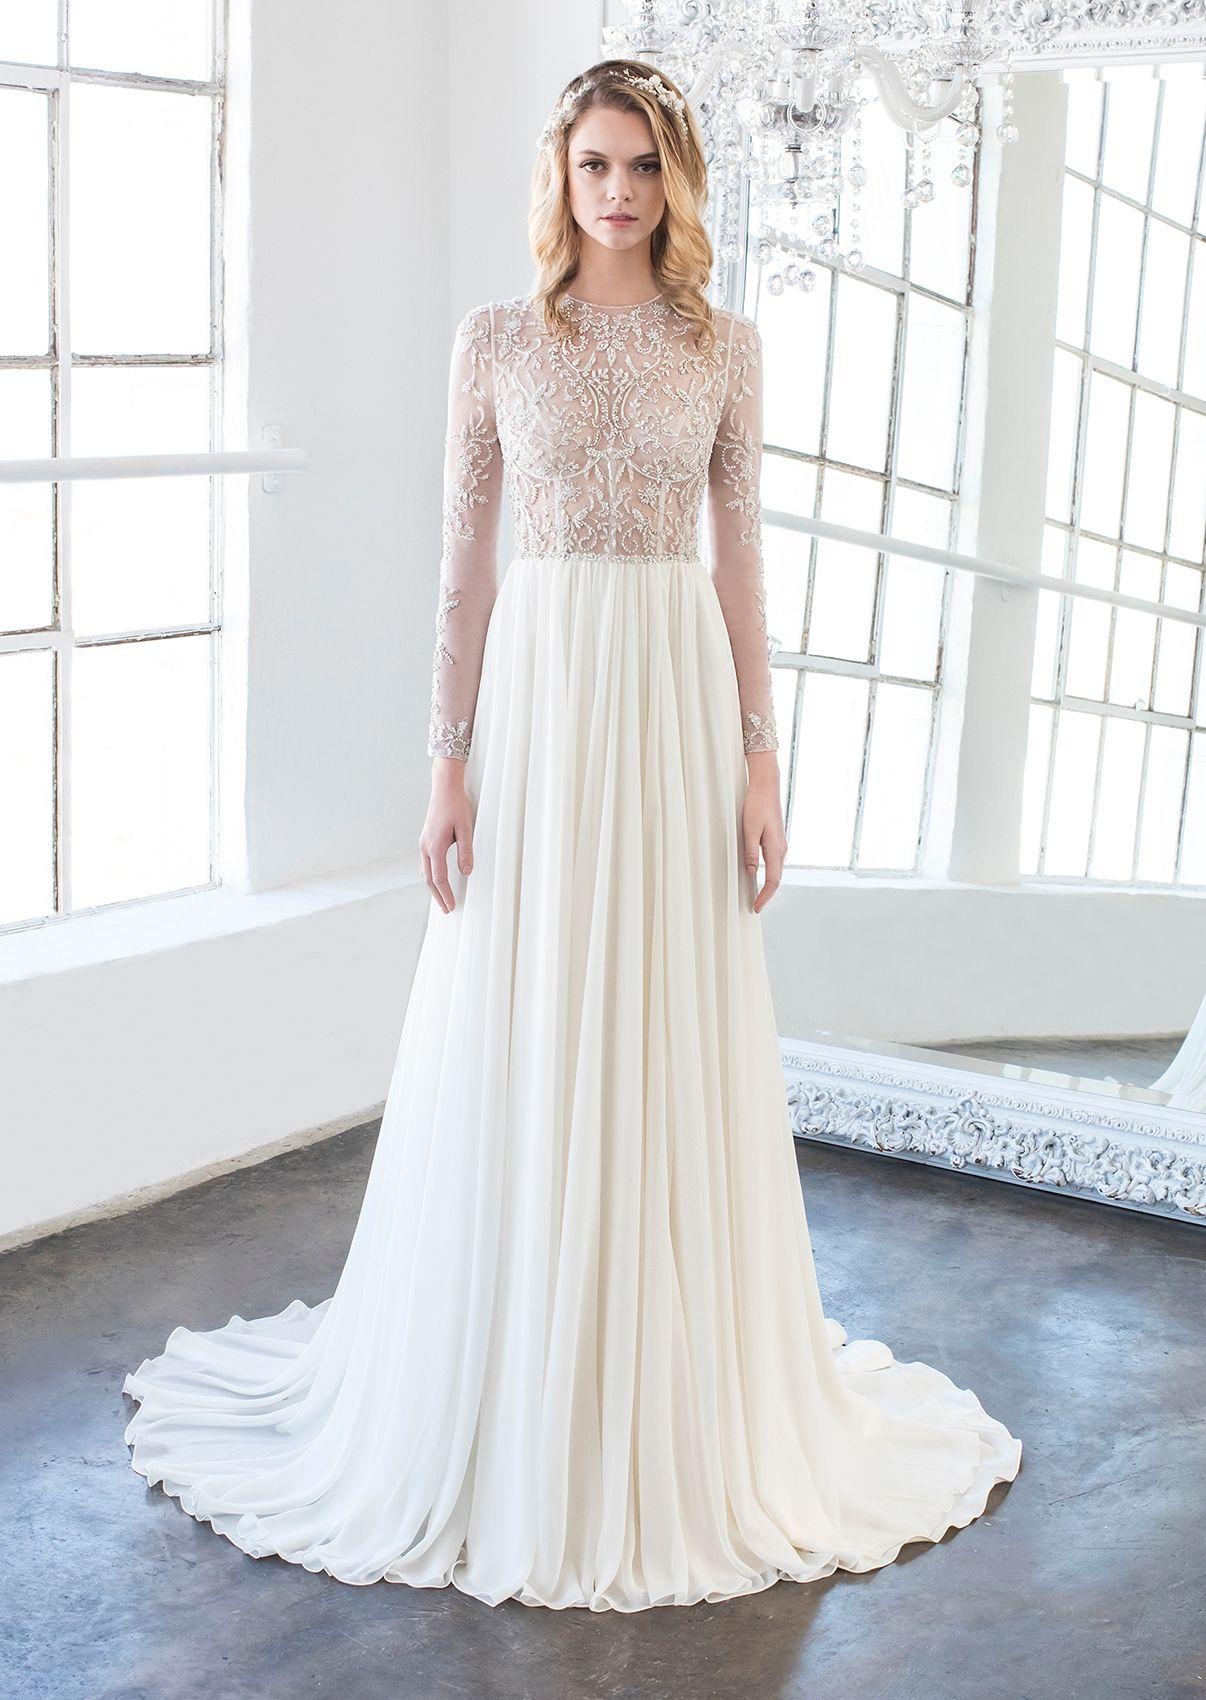 1c3bd53ef99 Winnie Couture is a celebrity designer of wedding dresses